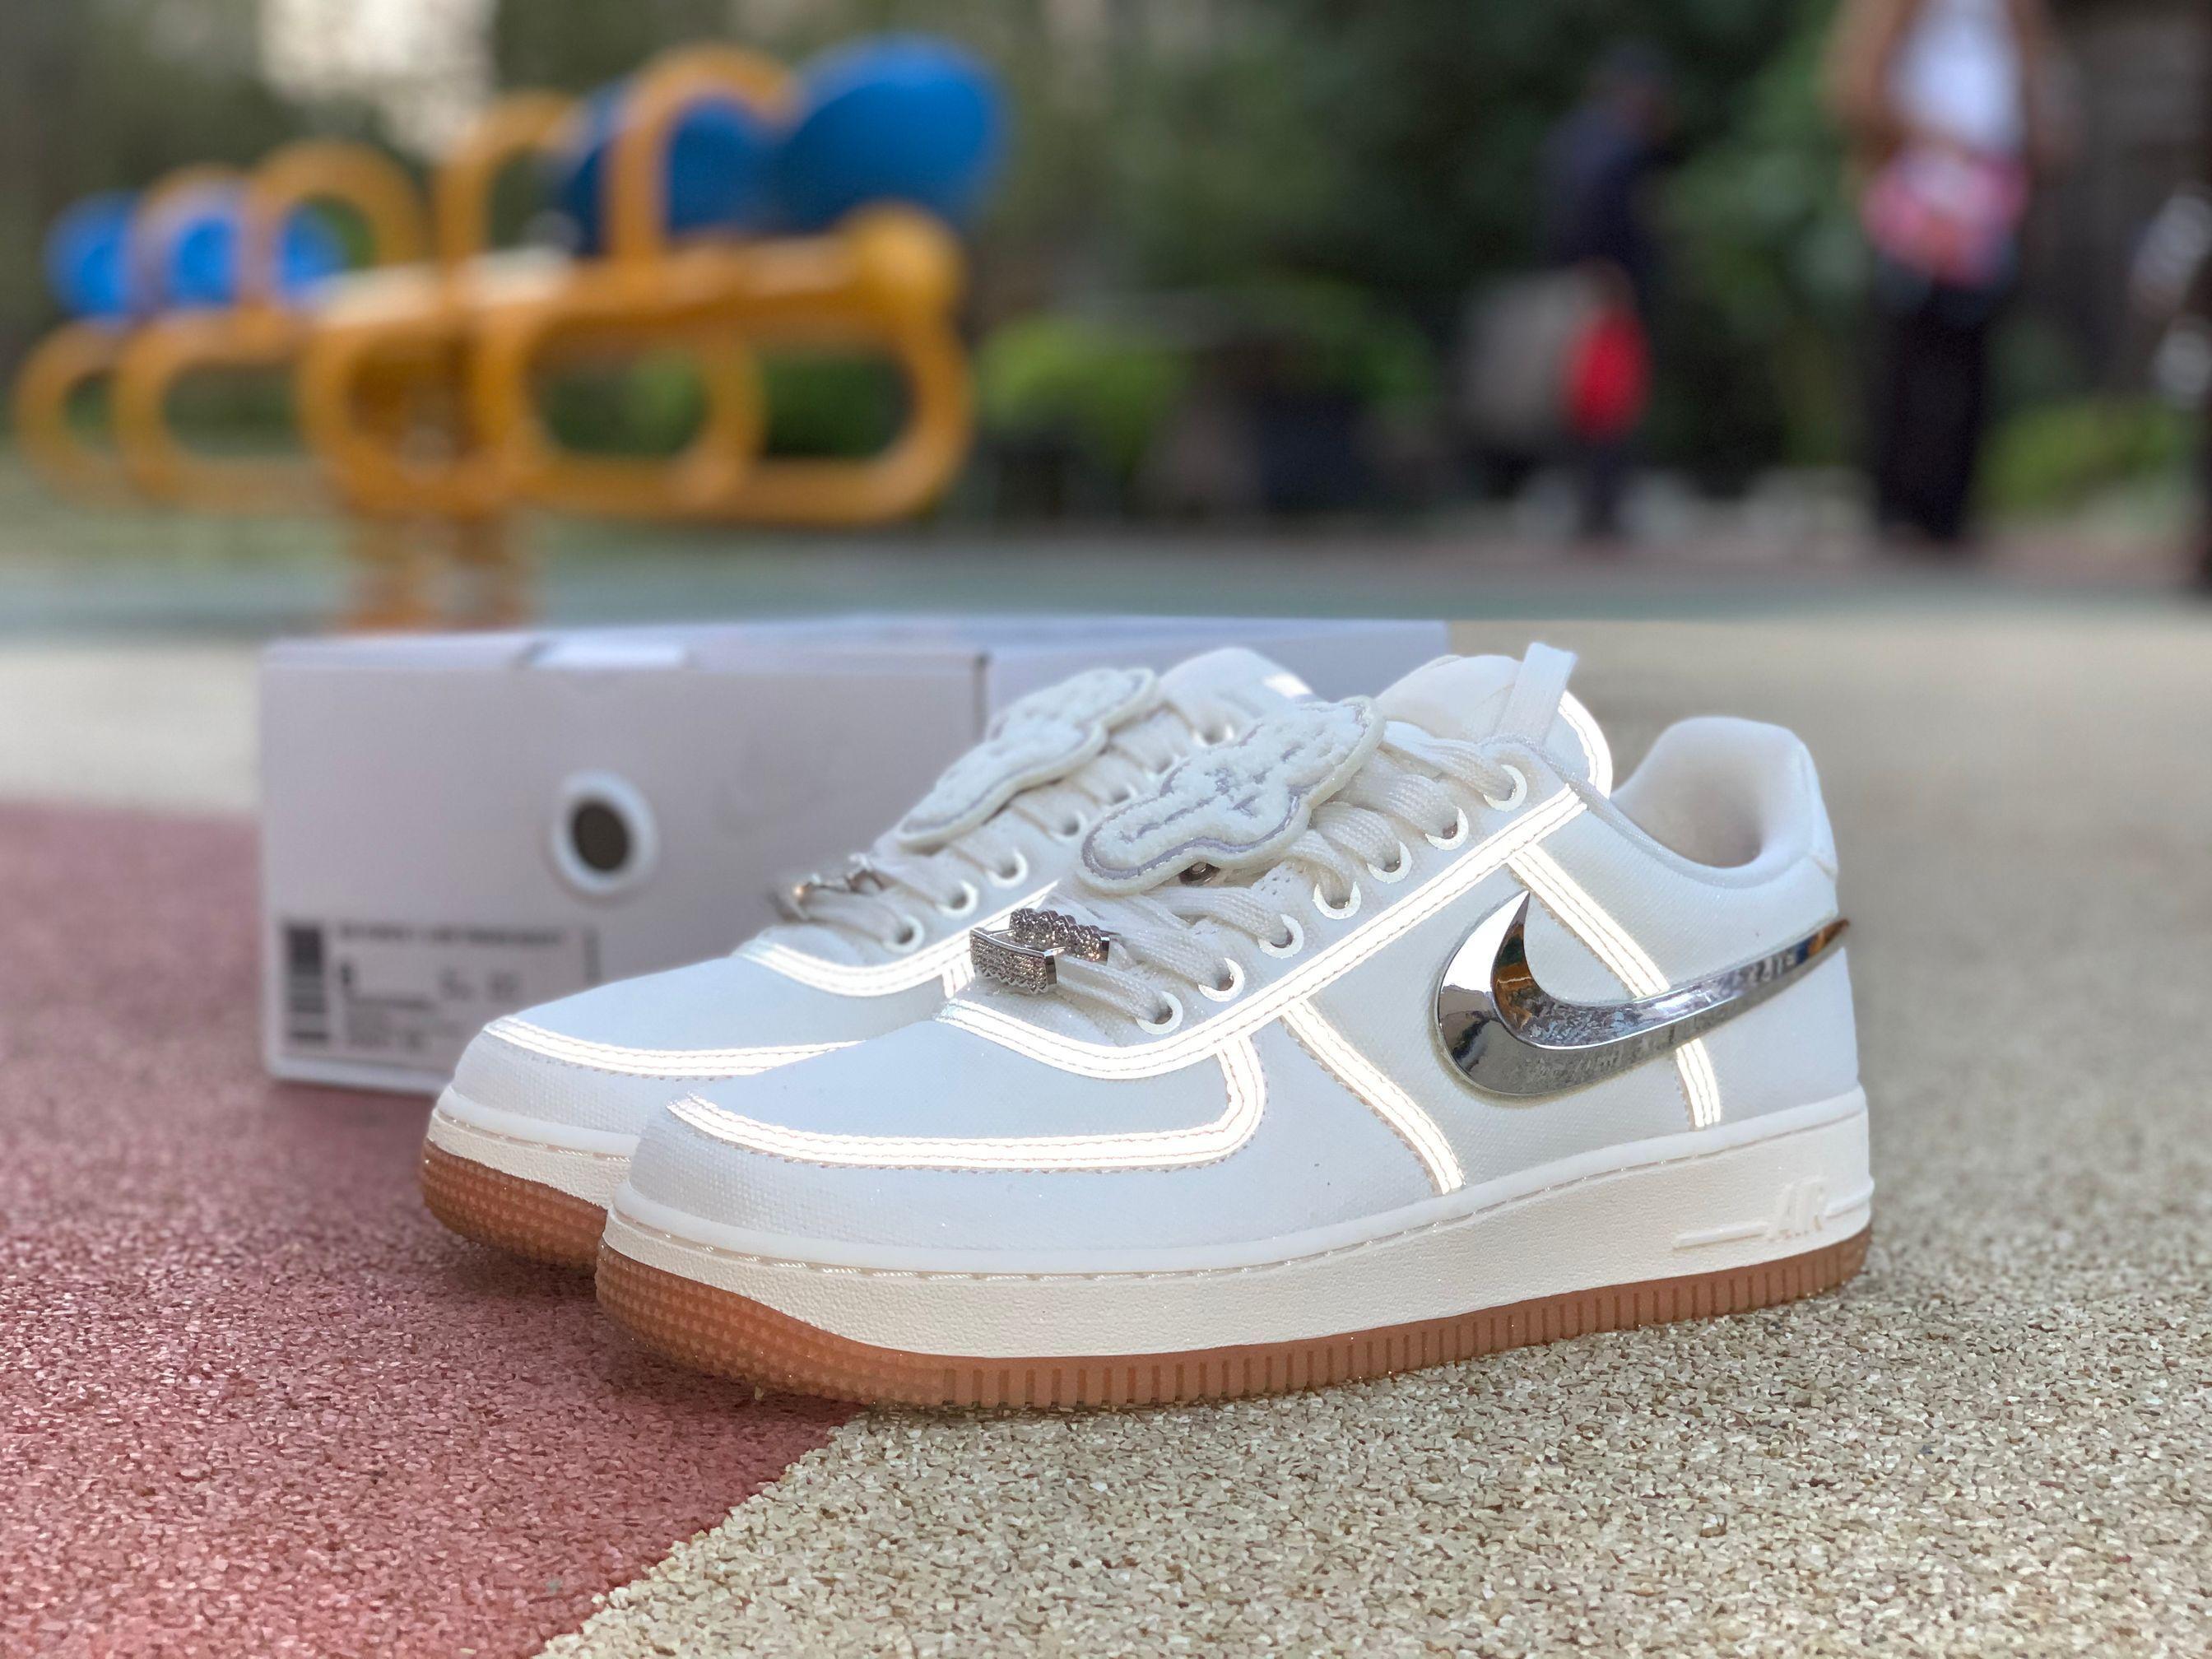 2020 Travis Scott x Nike Air Force 1